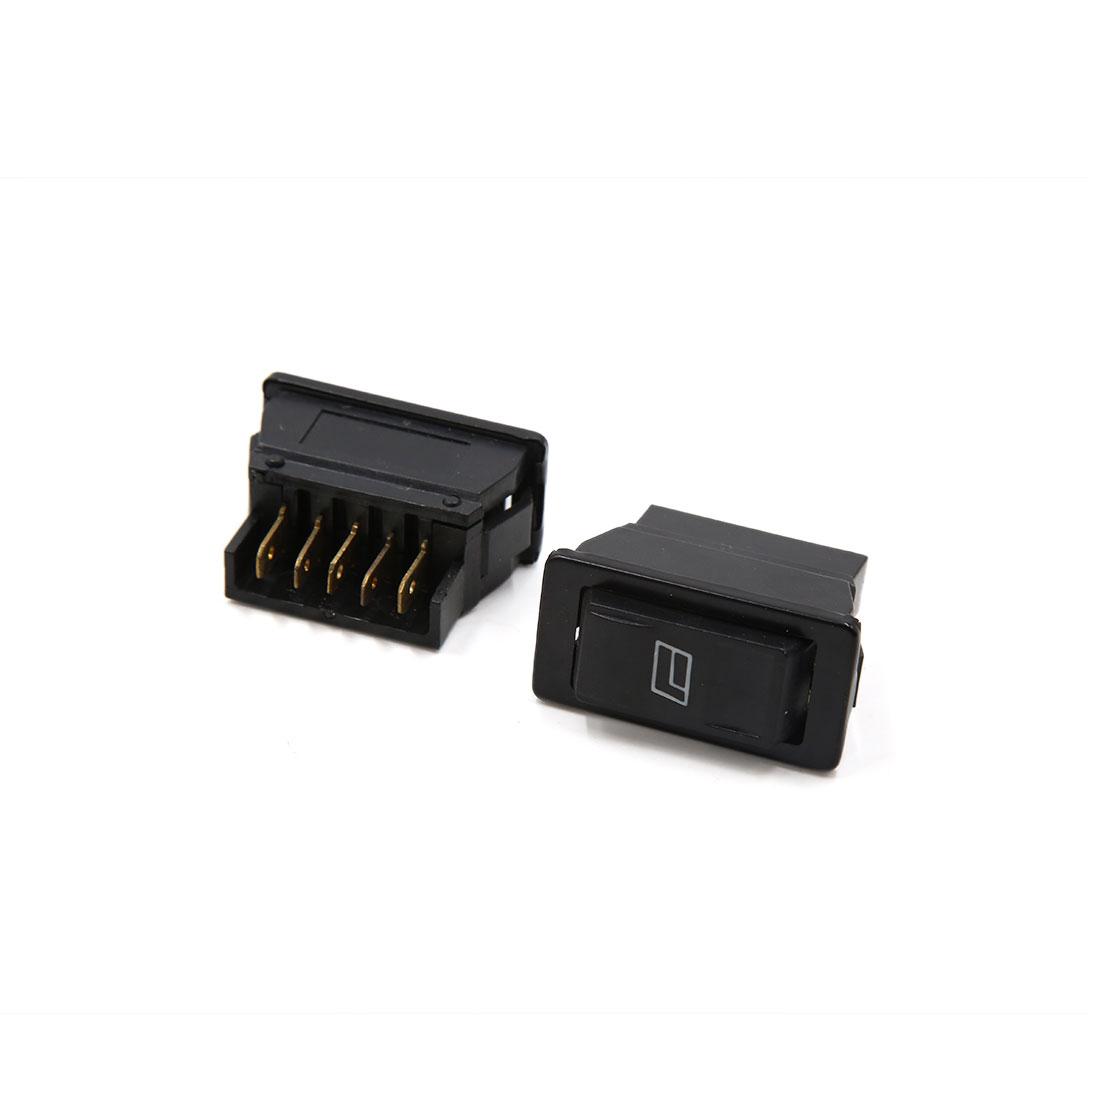 2Pcs 5 Terminals Black Car Electric Power Window Lifter Rocker Switch Controller